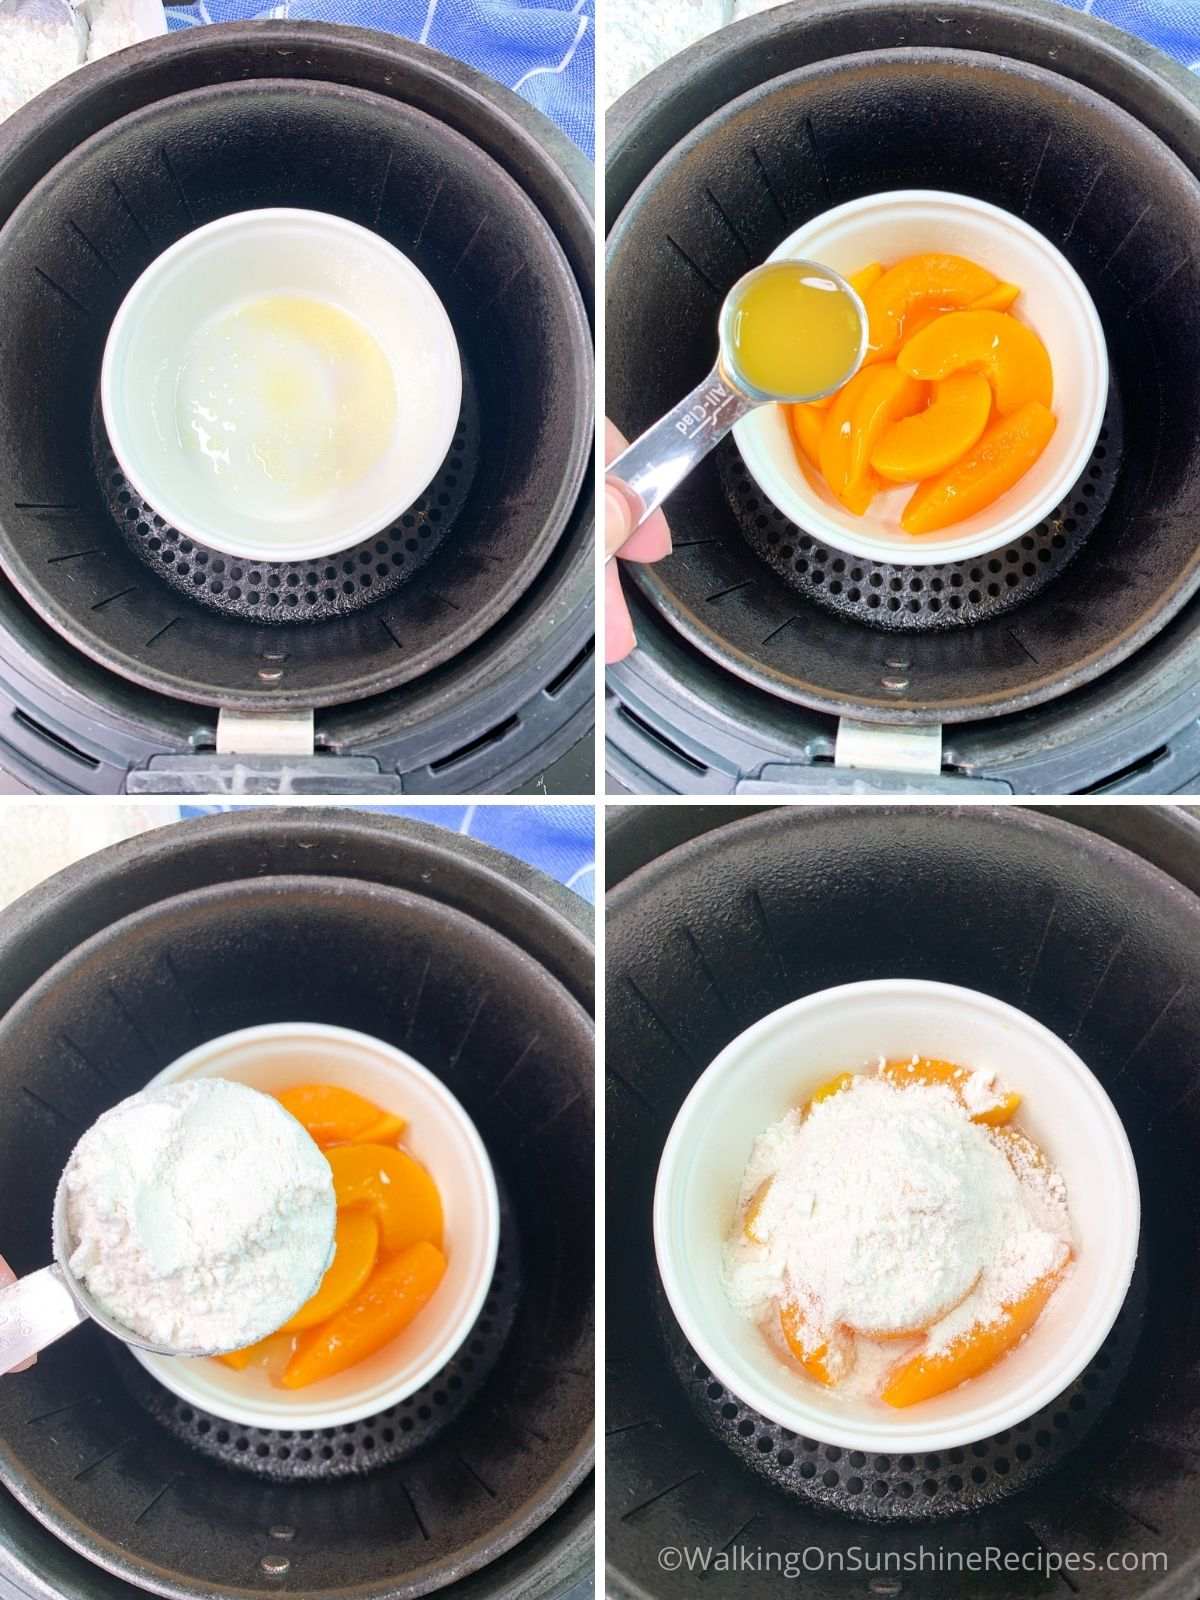 Add ingredients to baking dish in air fryer.